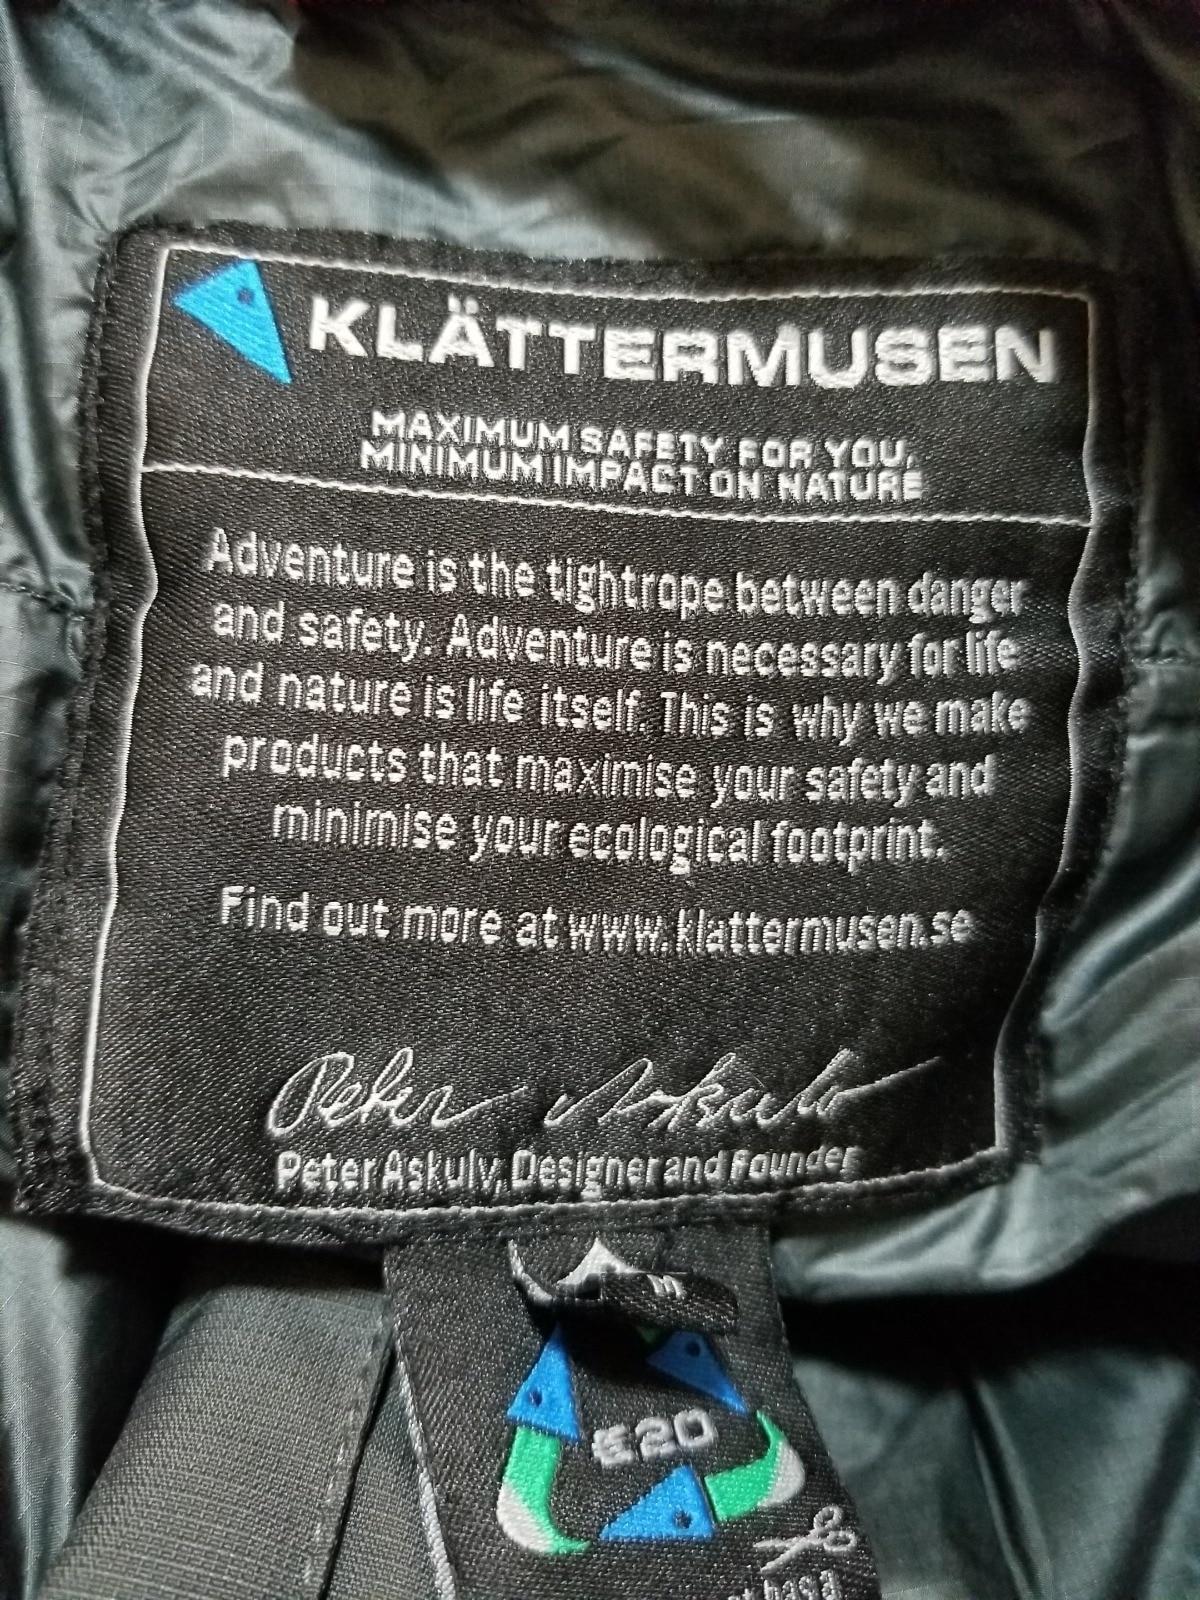 KLATTERMUSEN(クレッタルムーセン)のダウンジャケット